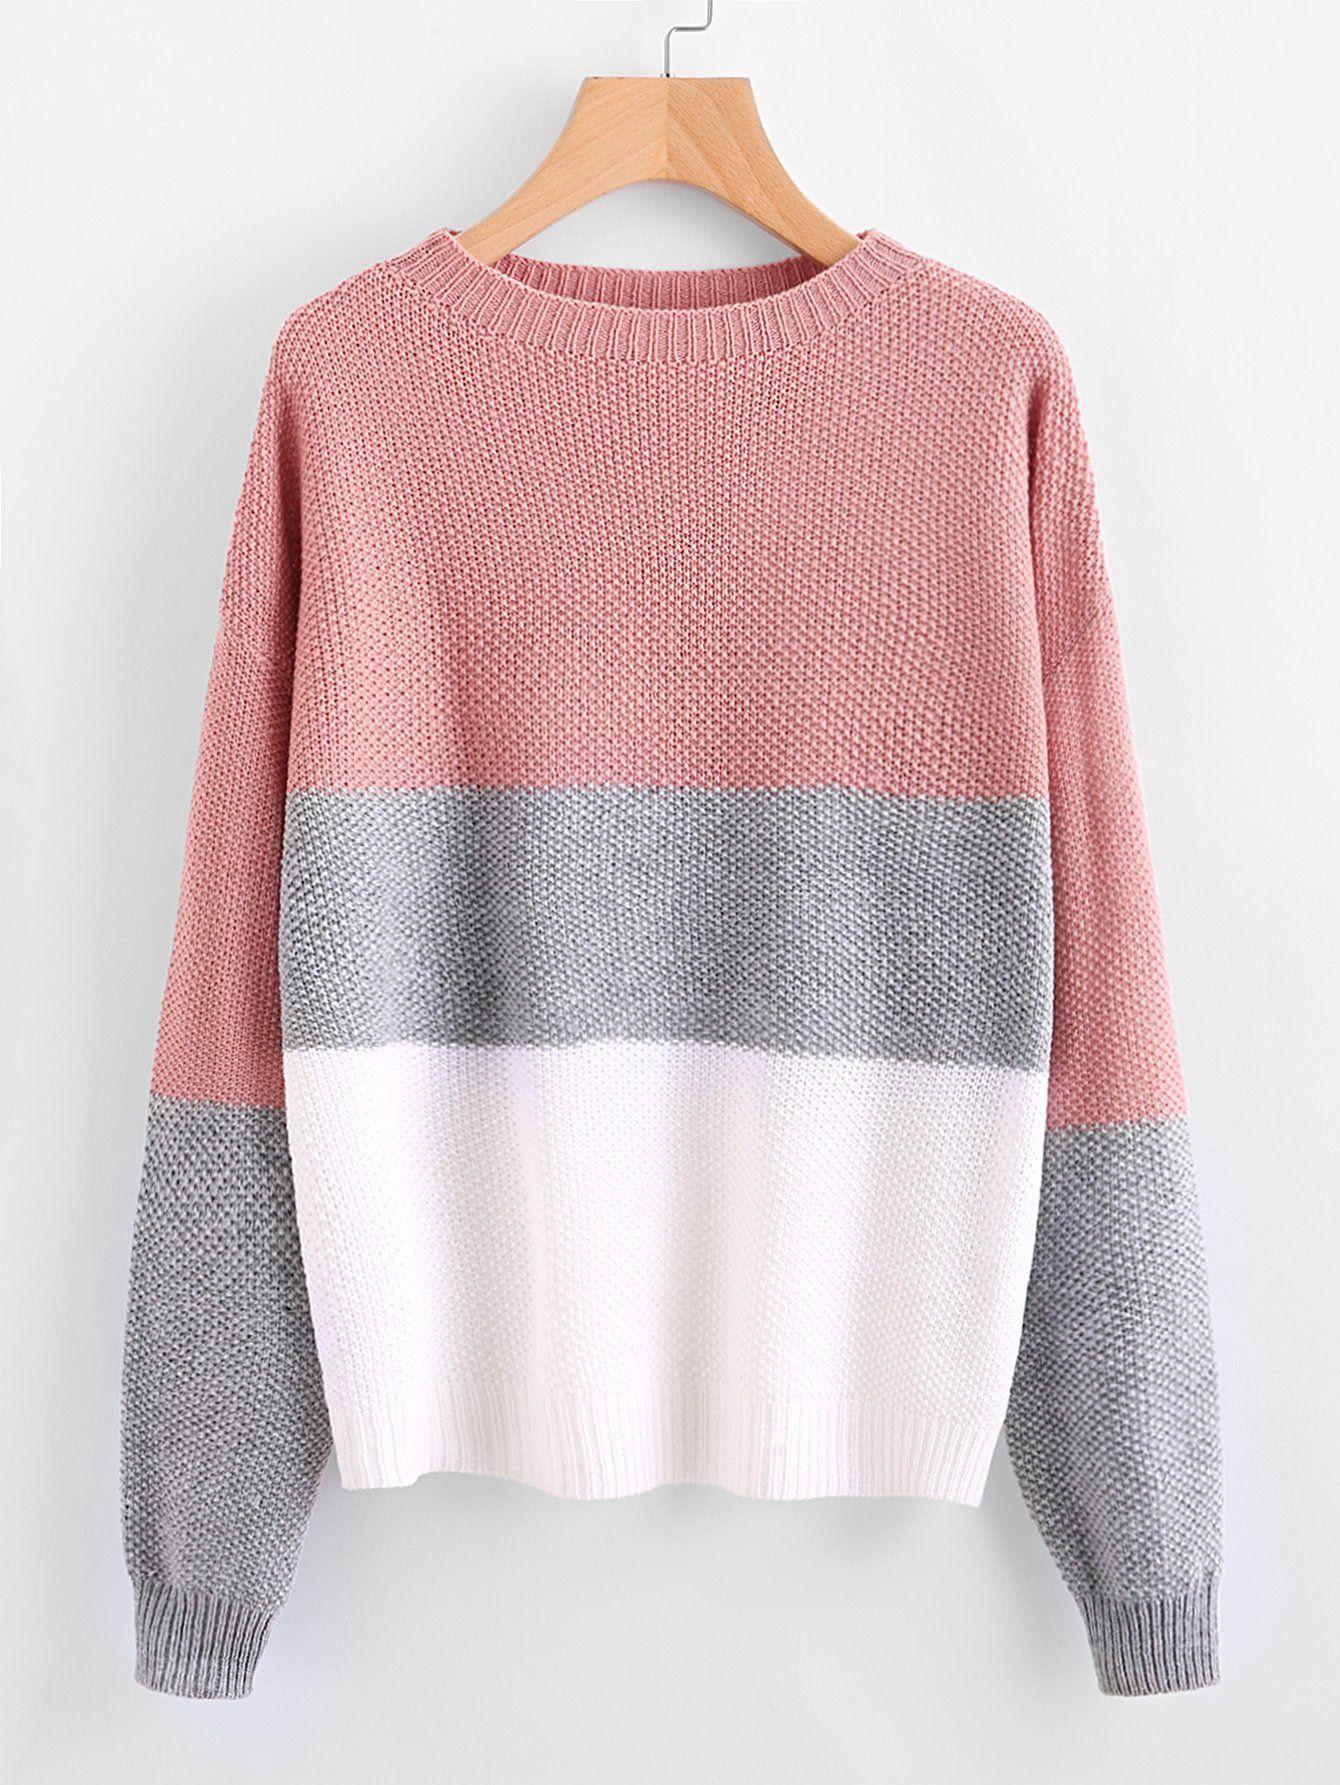 b0c731a8bb73 Multicolor Color Block Drop Shoulder Textured Sweater   Knitwear ...